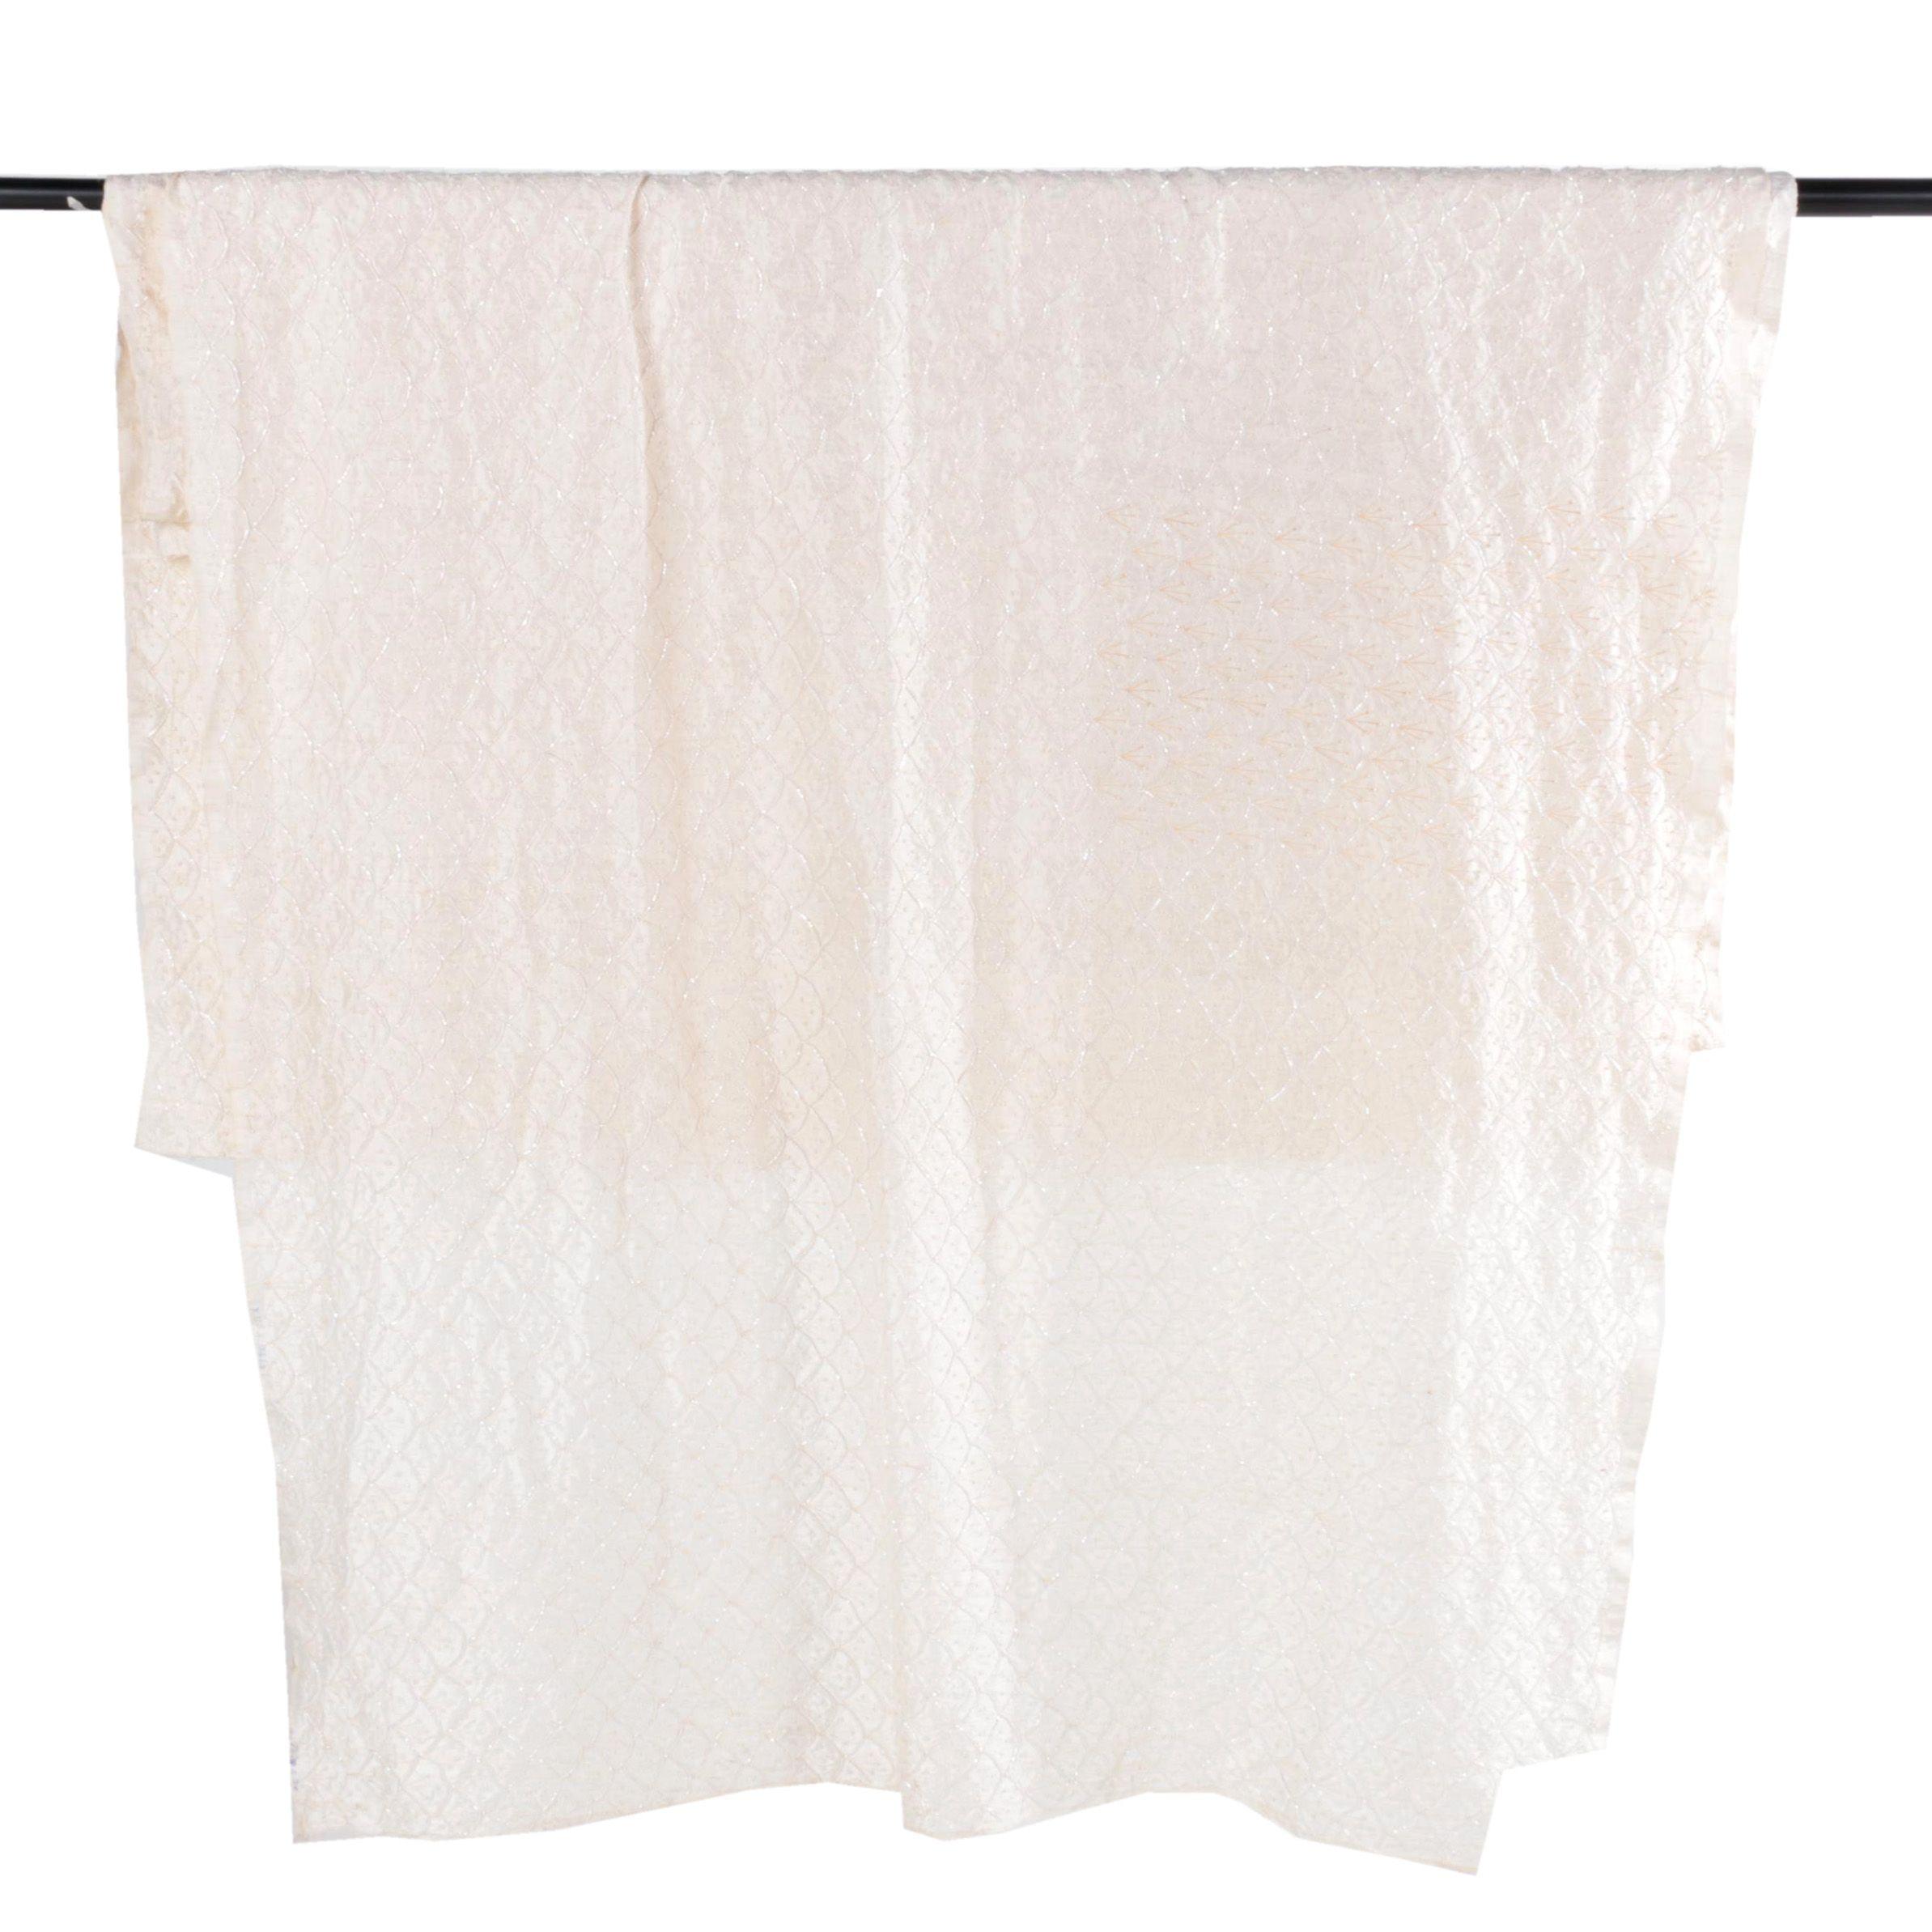 Vintage White Beaded Fabric